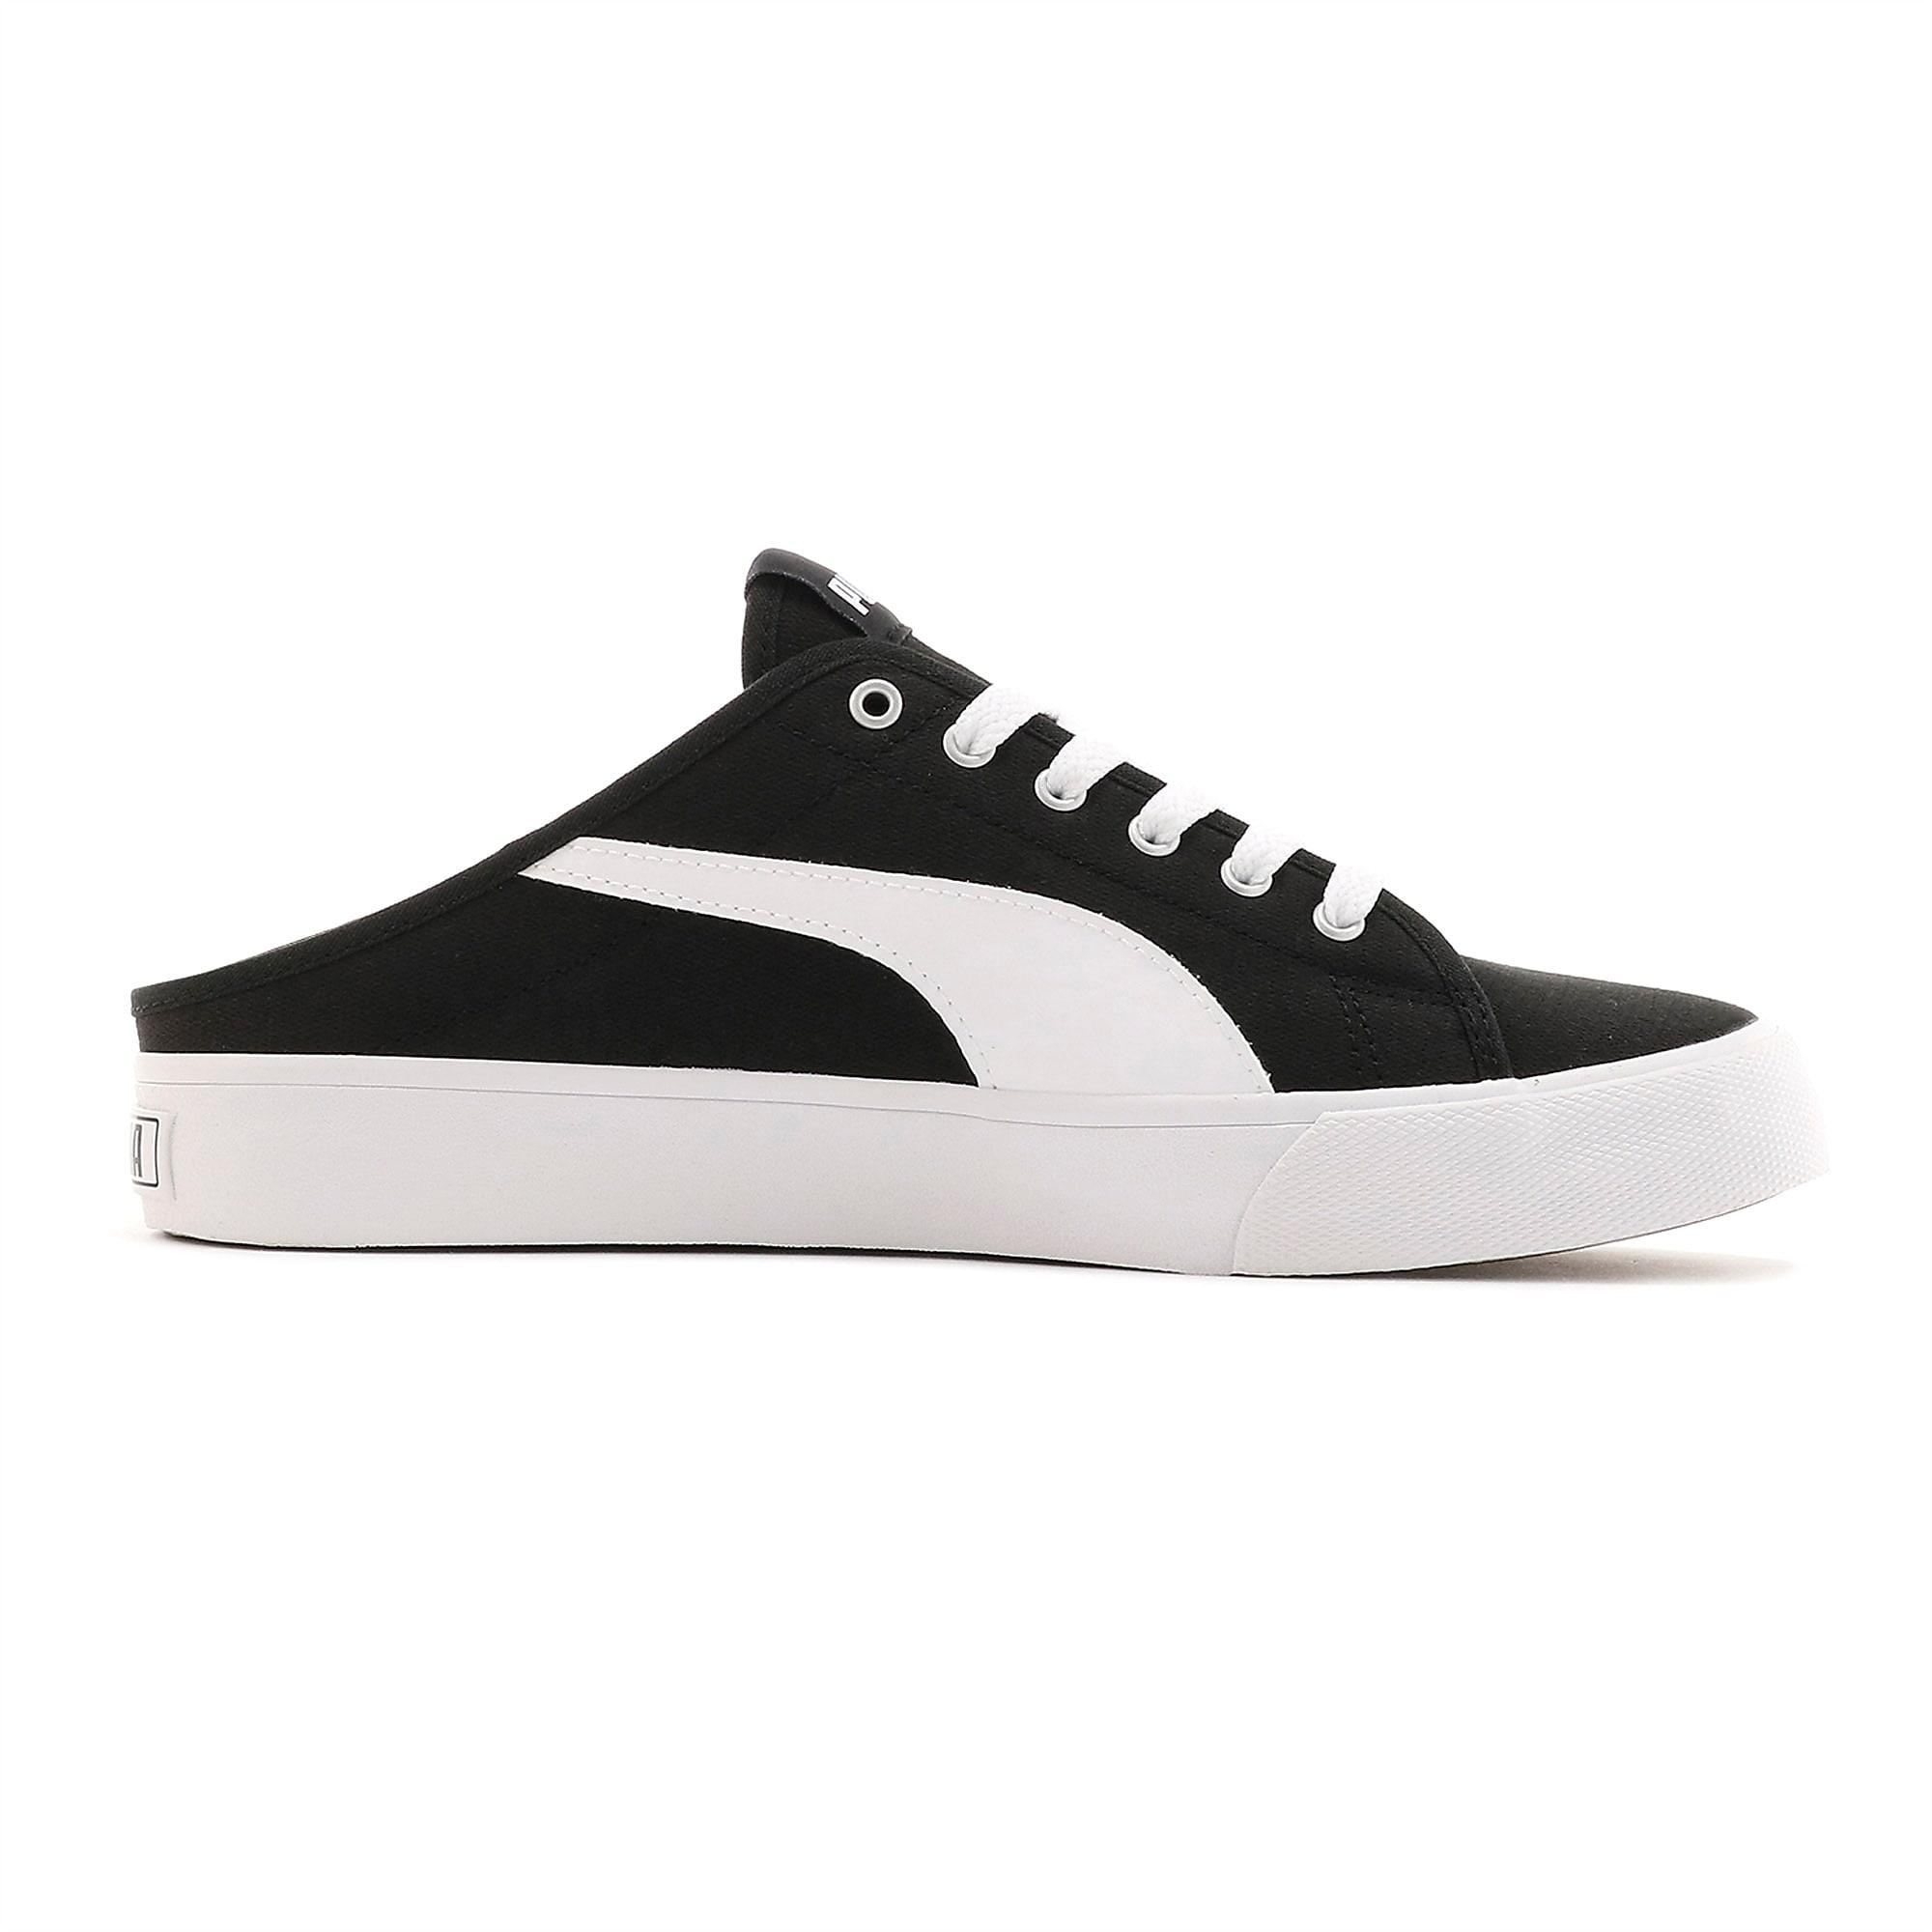 PUMA Canvas Bari Mule Shoes in Black for Men - Lyst